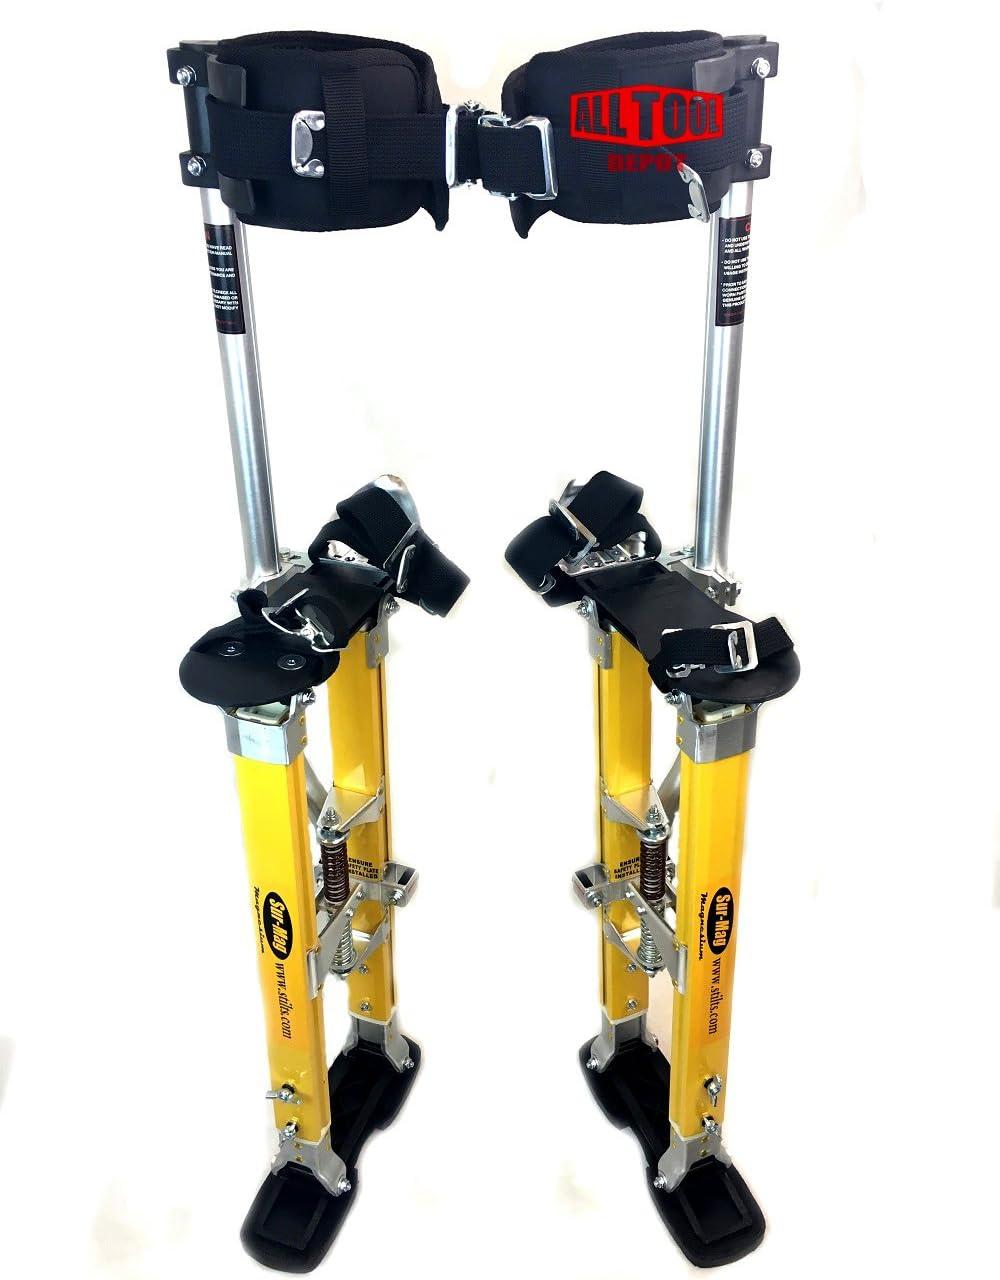 SurPro SP price Quad Lock Magnesium Drywall 24-40 Super Special SALE held in. Stilts SUR-SP-2